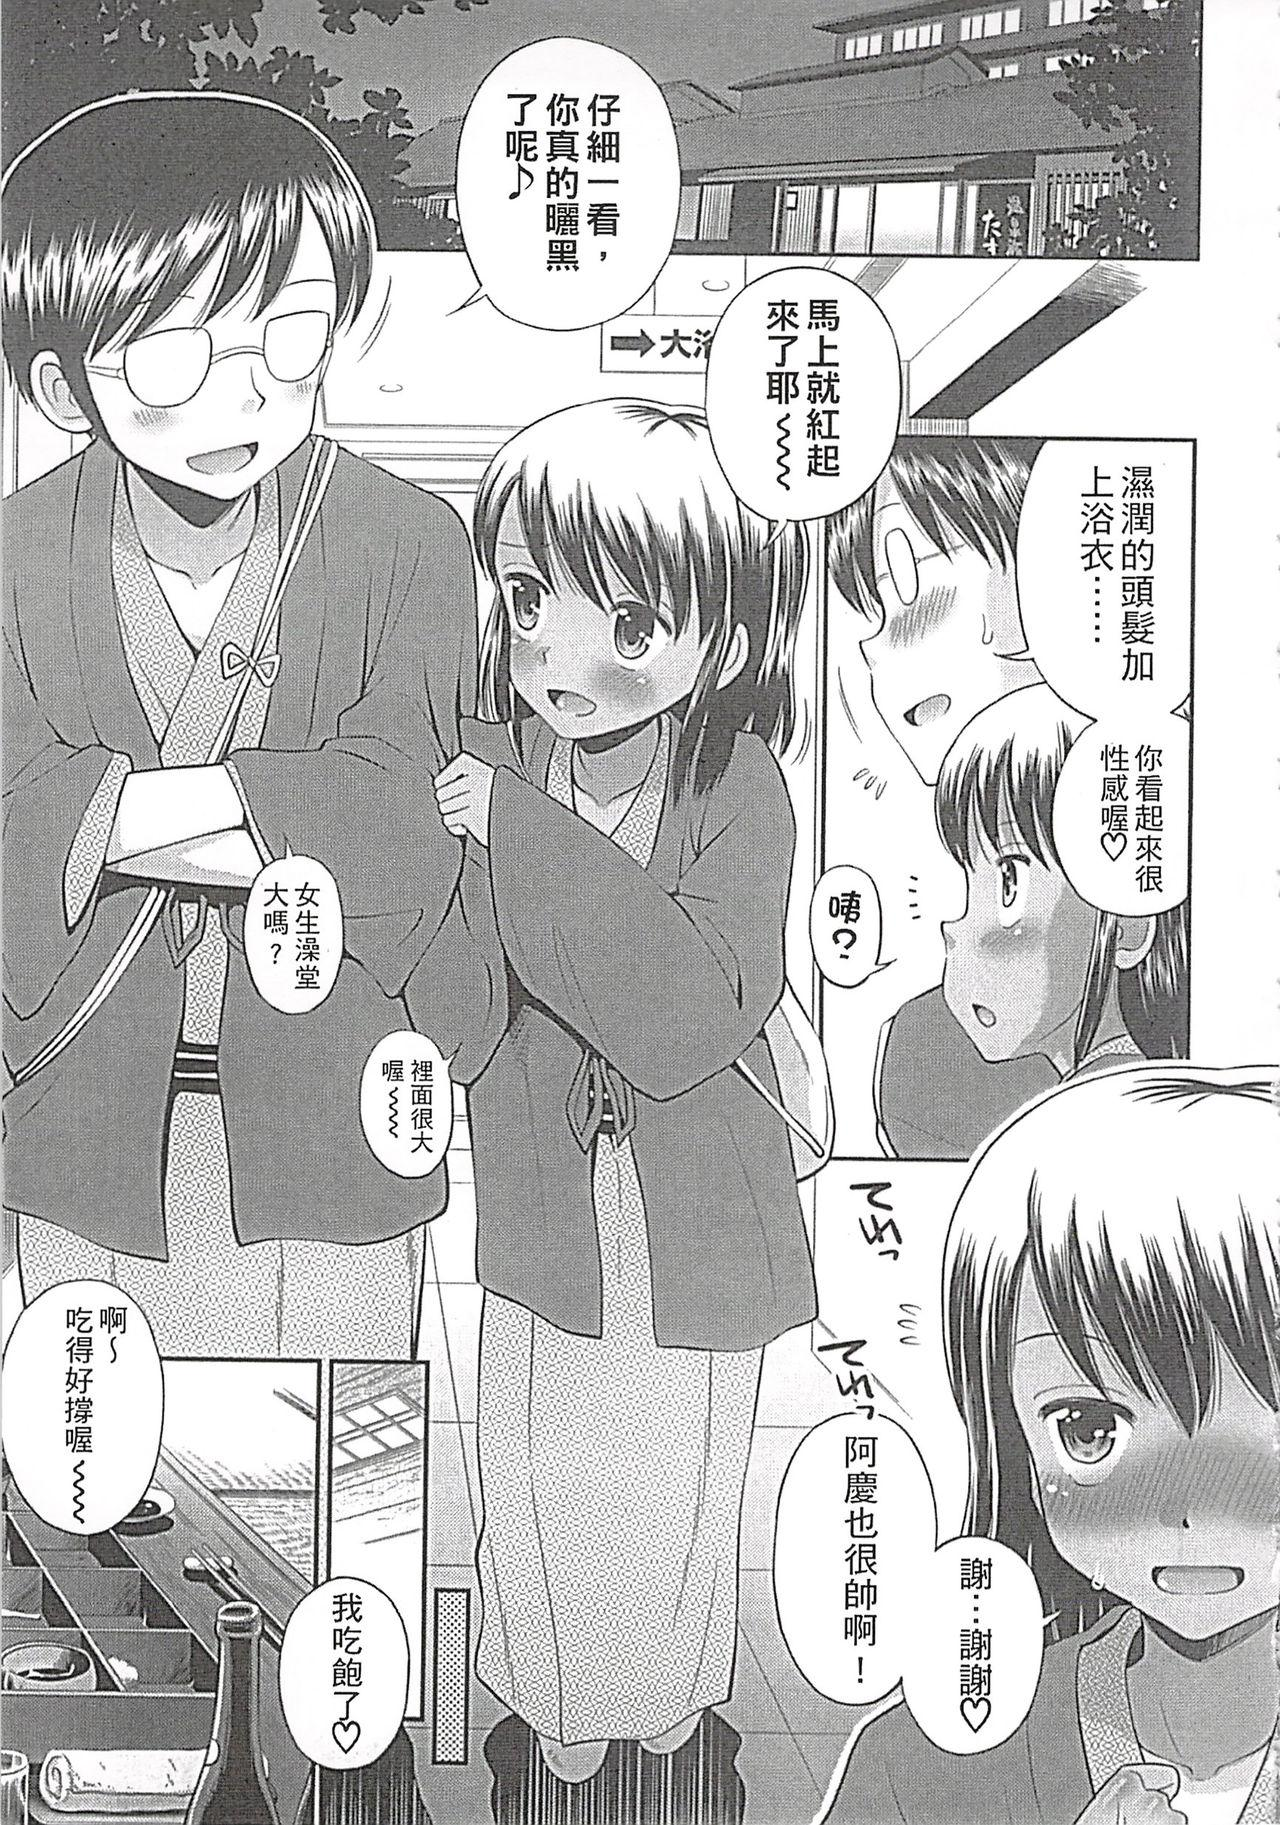 Kore demo Otona Desu Kedo!? Mrs.LOLITA Kanzenban   人家是大人啦! ~Mrs.LOLITA完全版 156